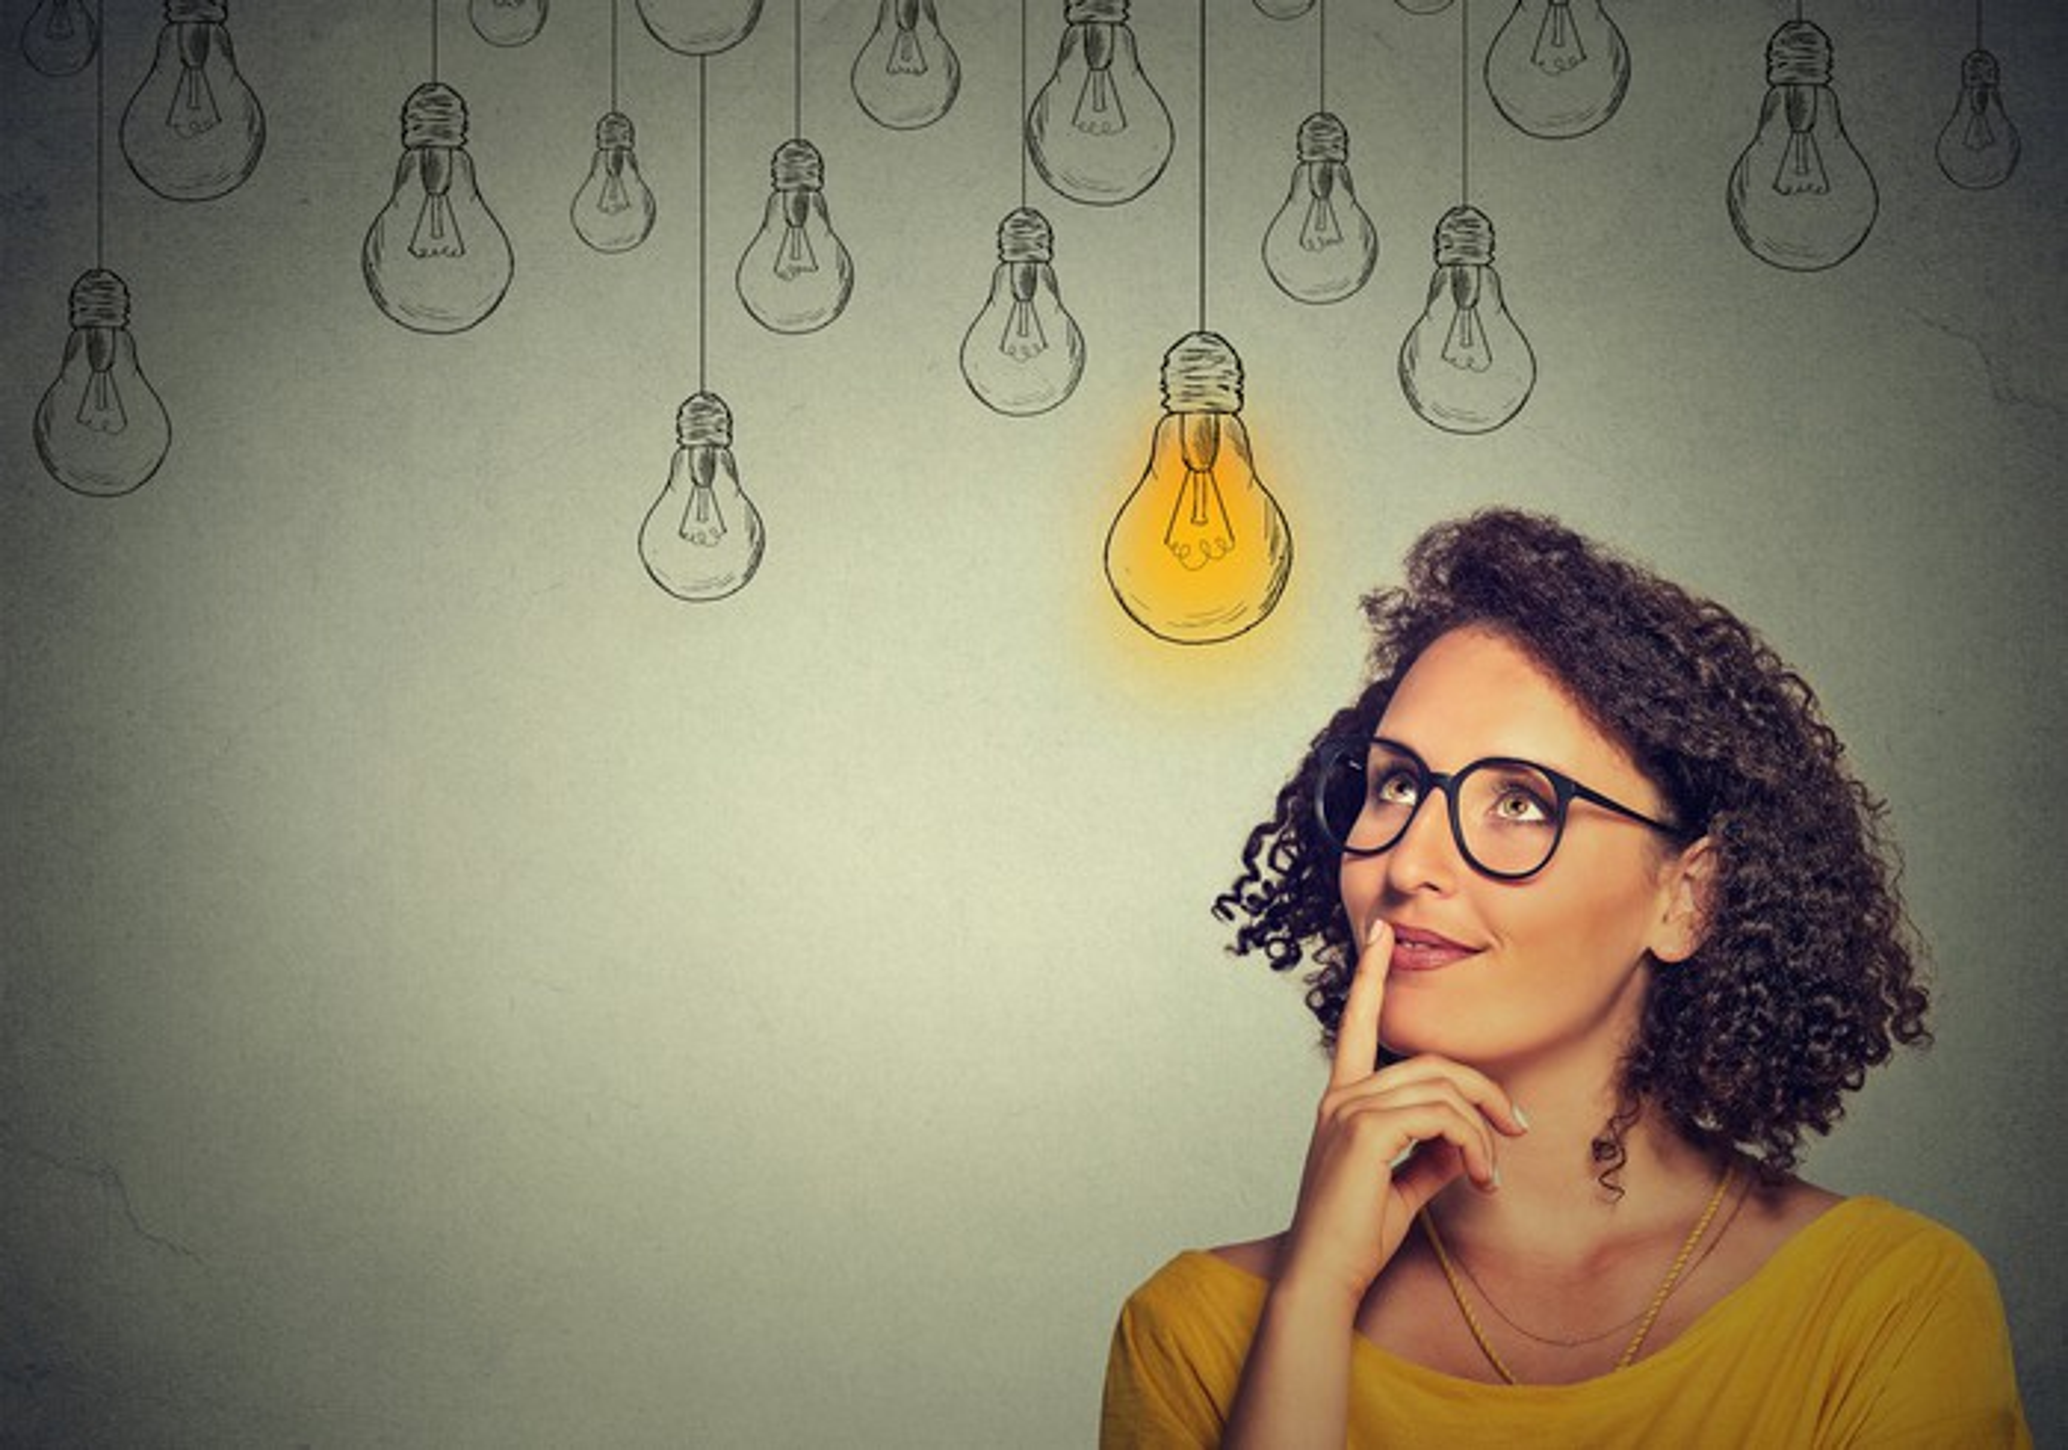 A woman looking an an illustration of a lightbulb